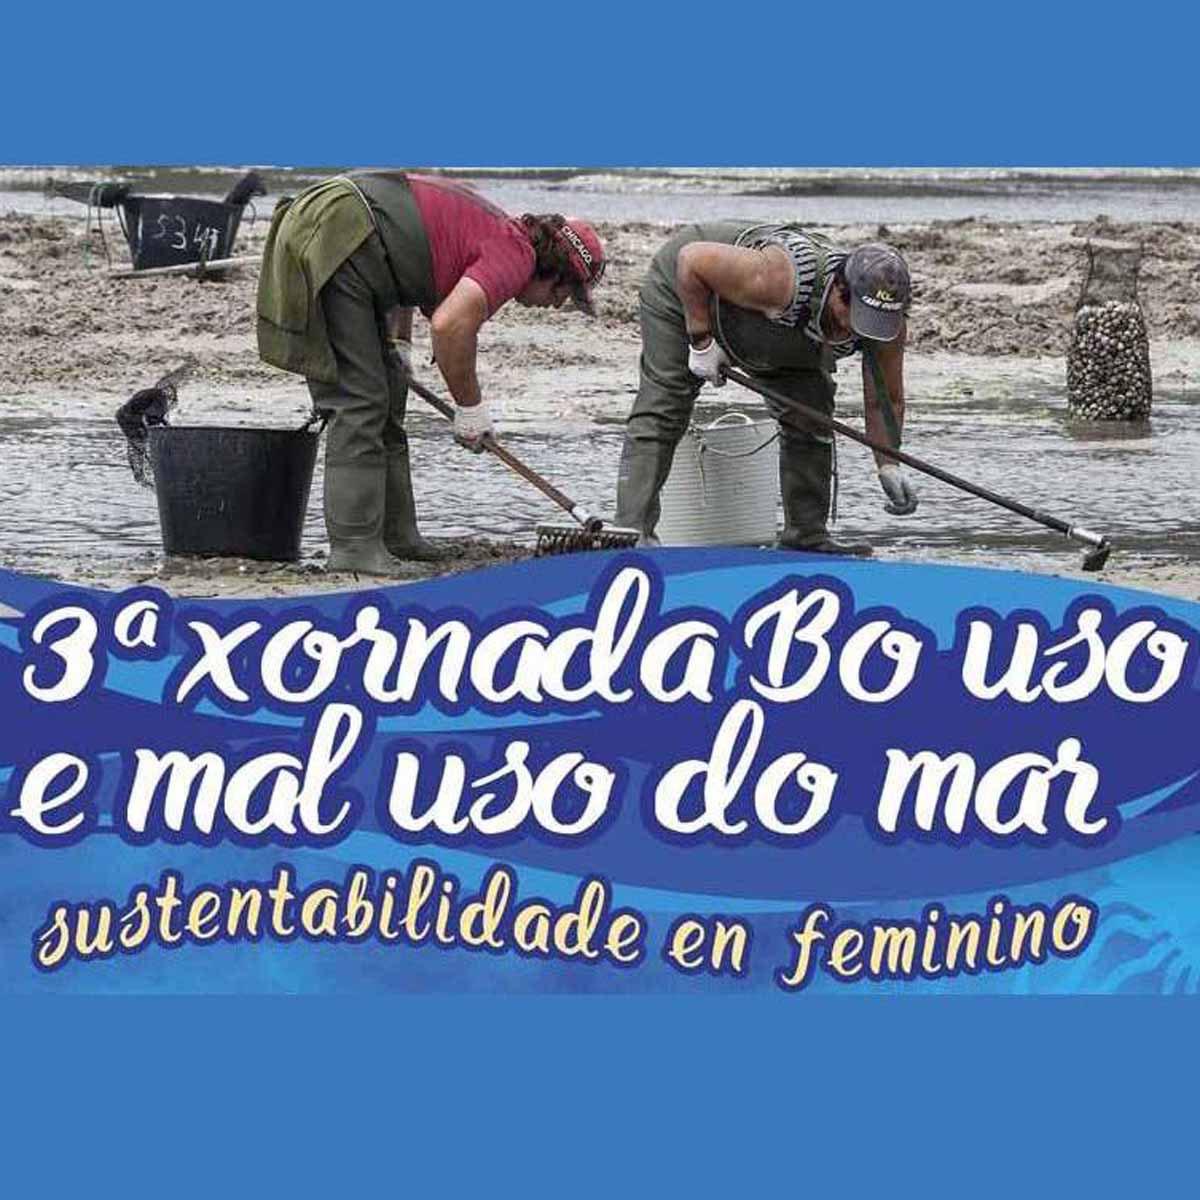 3ª Xornada Bo uso e mal uso do mar. Sustentabilidade en feminino